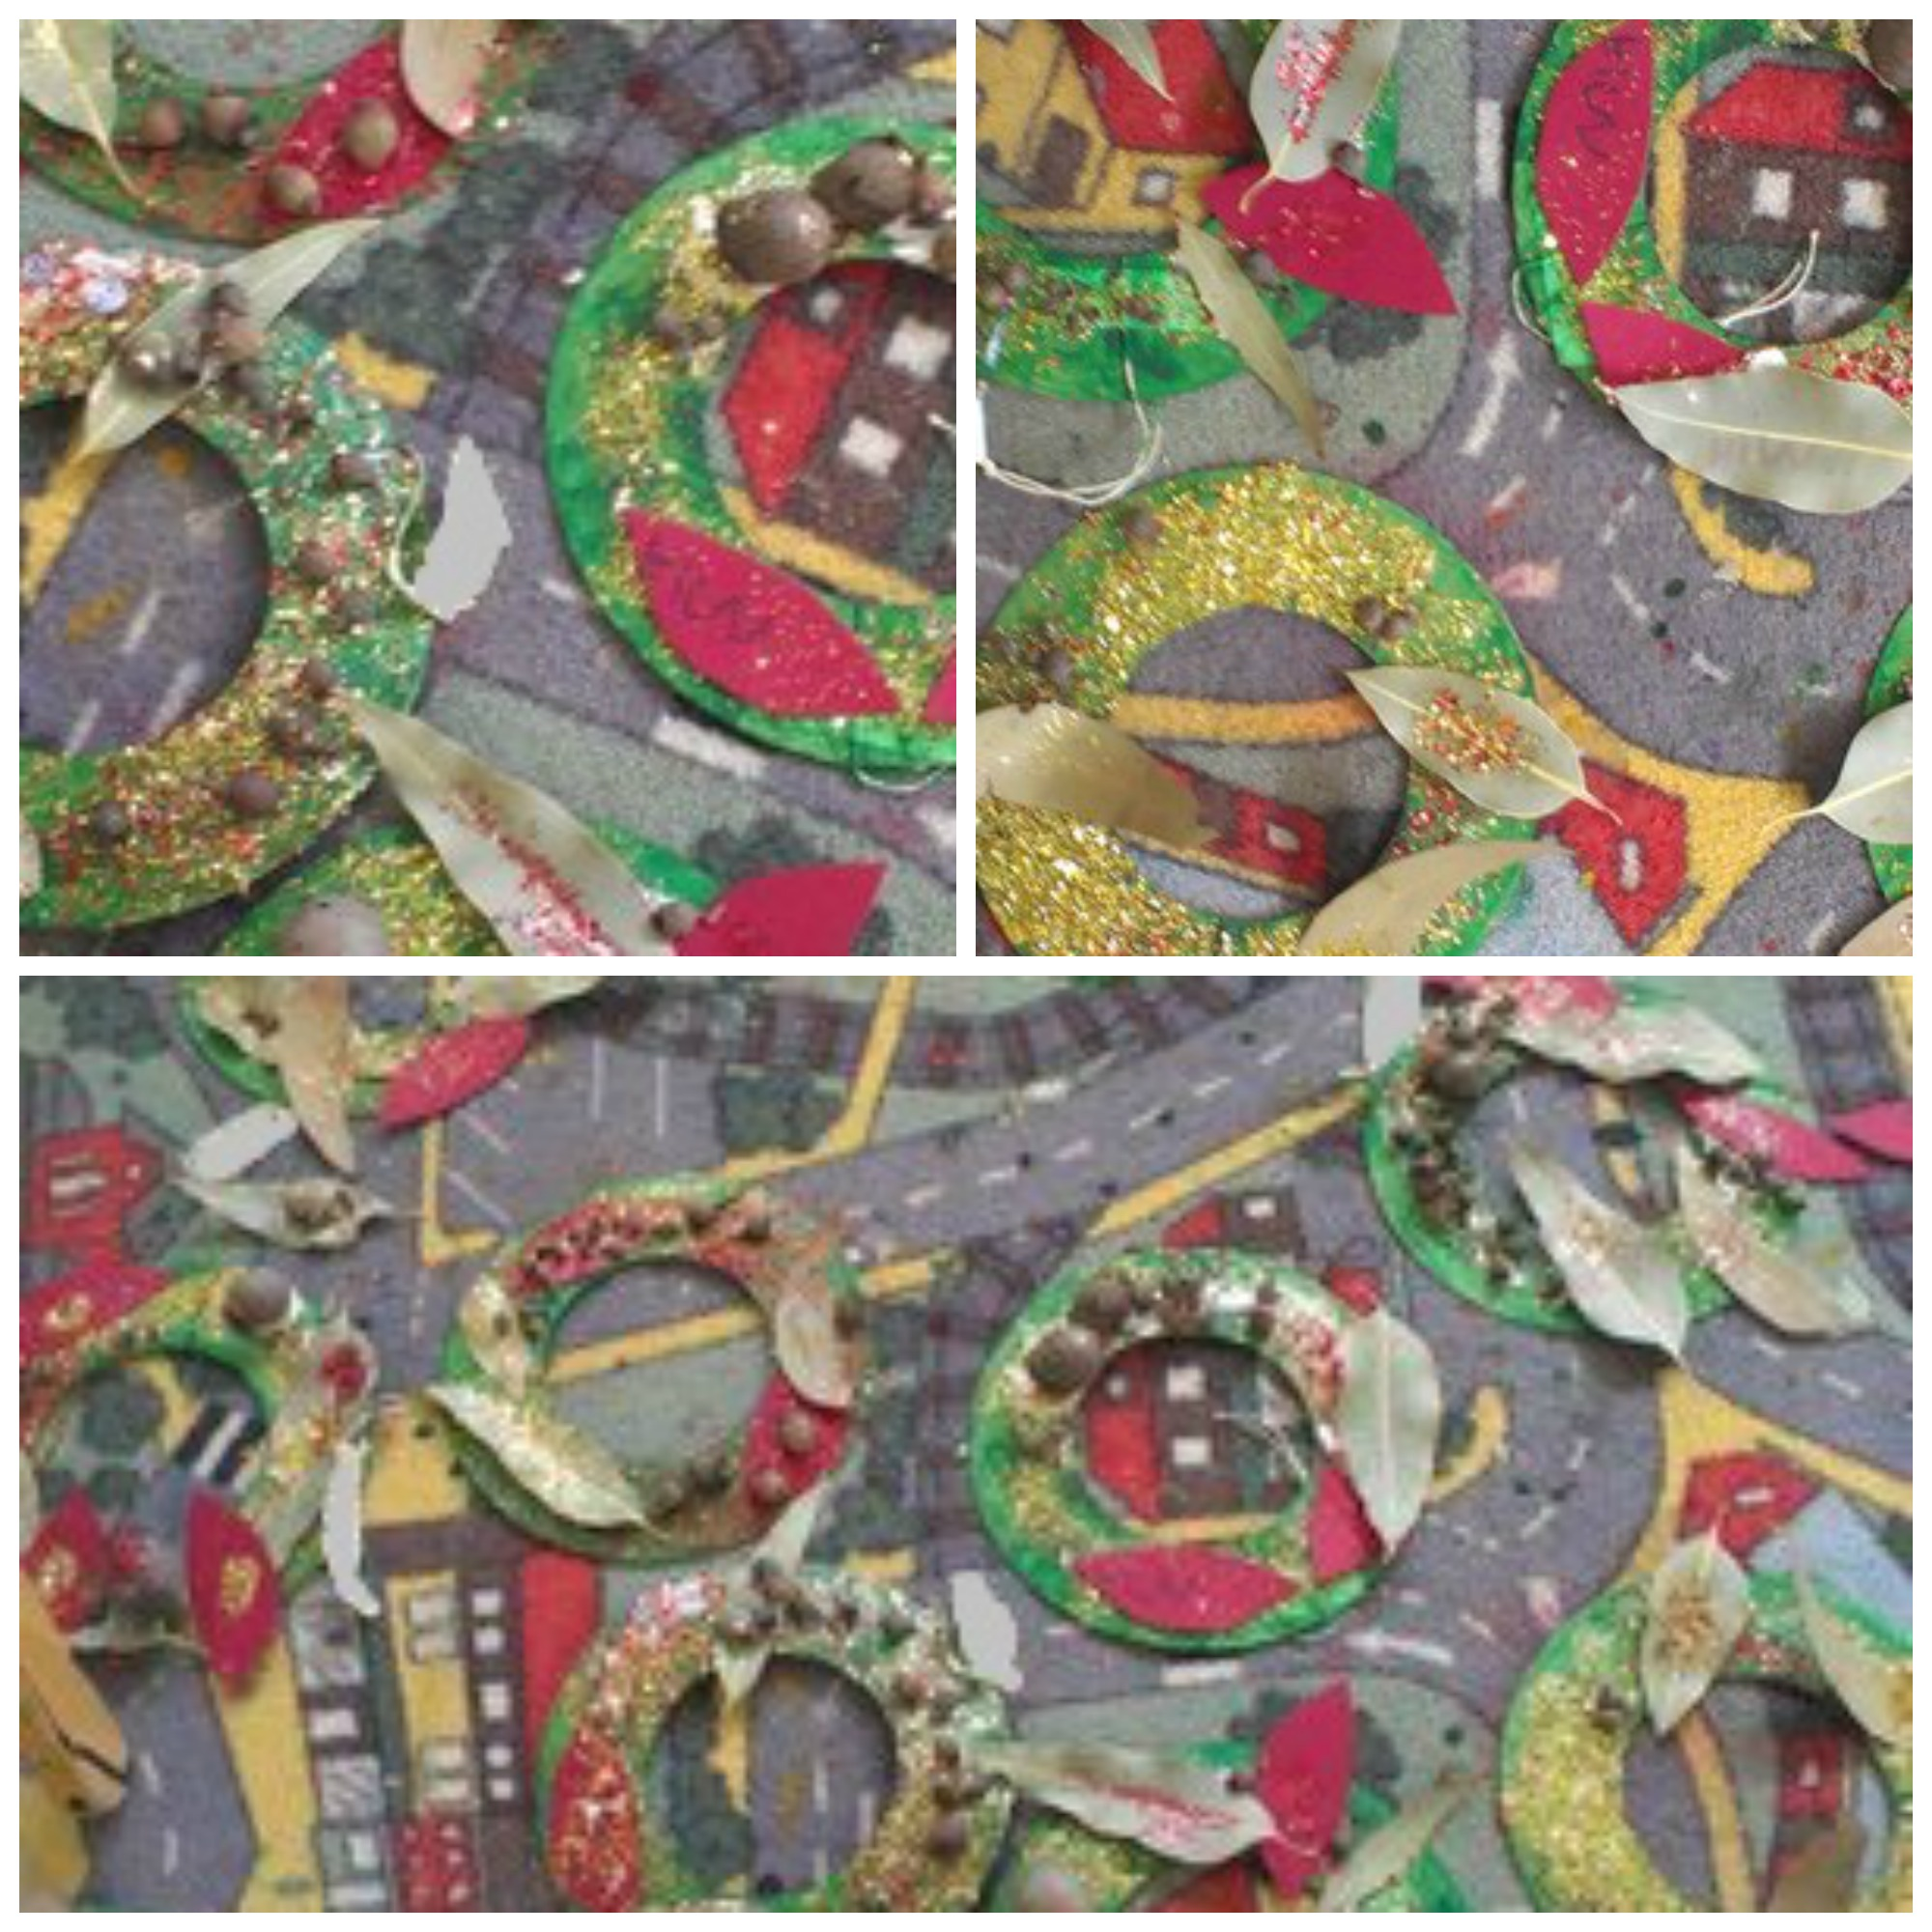 gumnut wreaths drying - kids Christmas craft